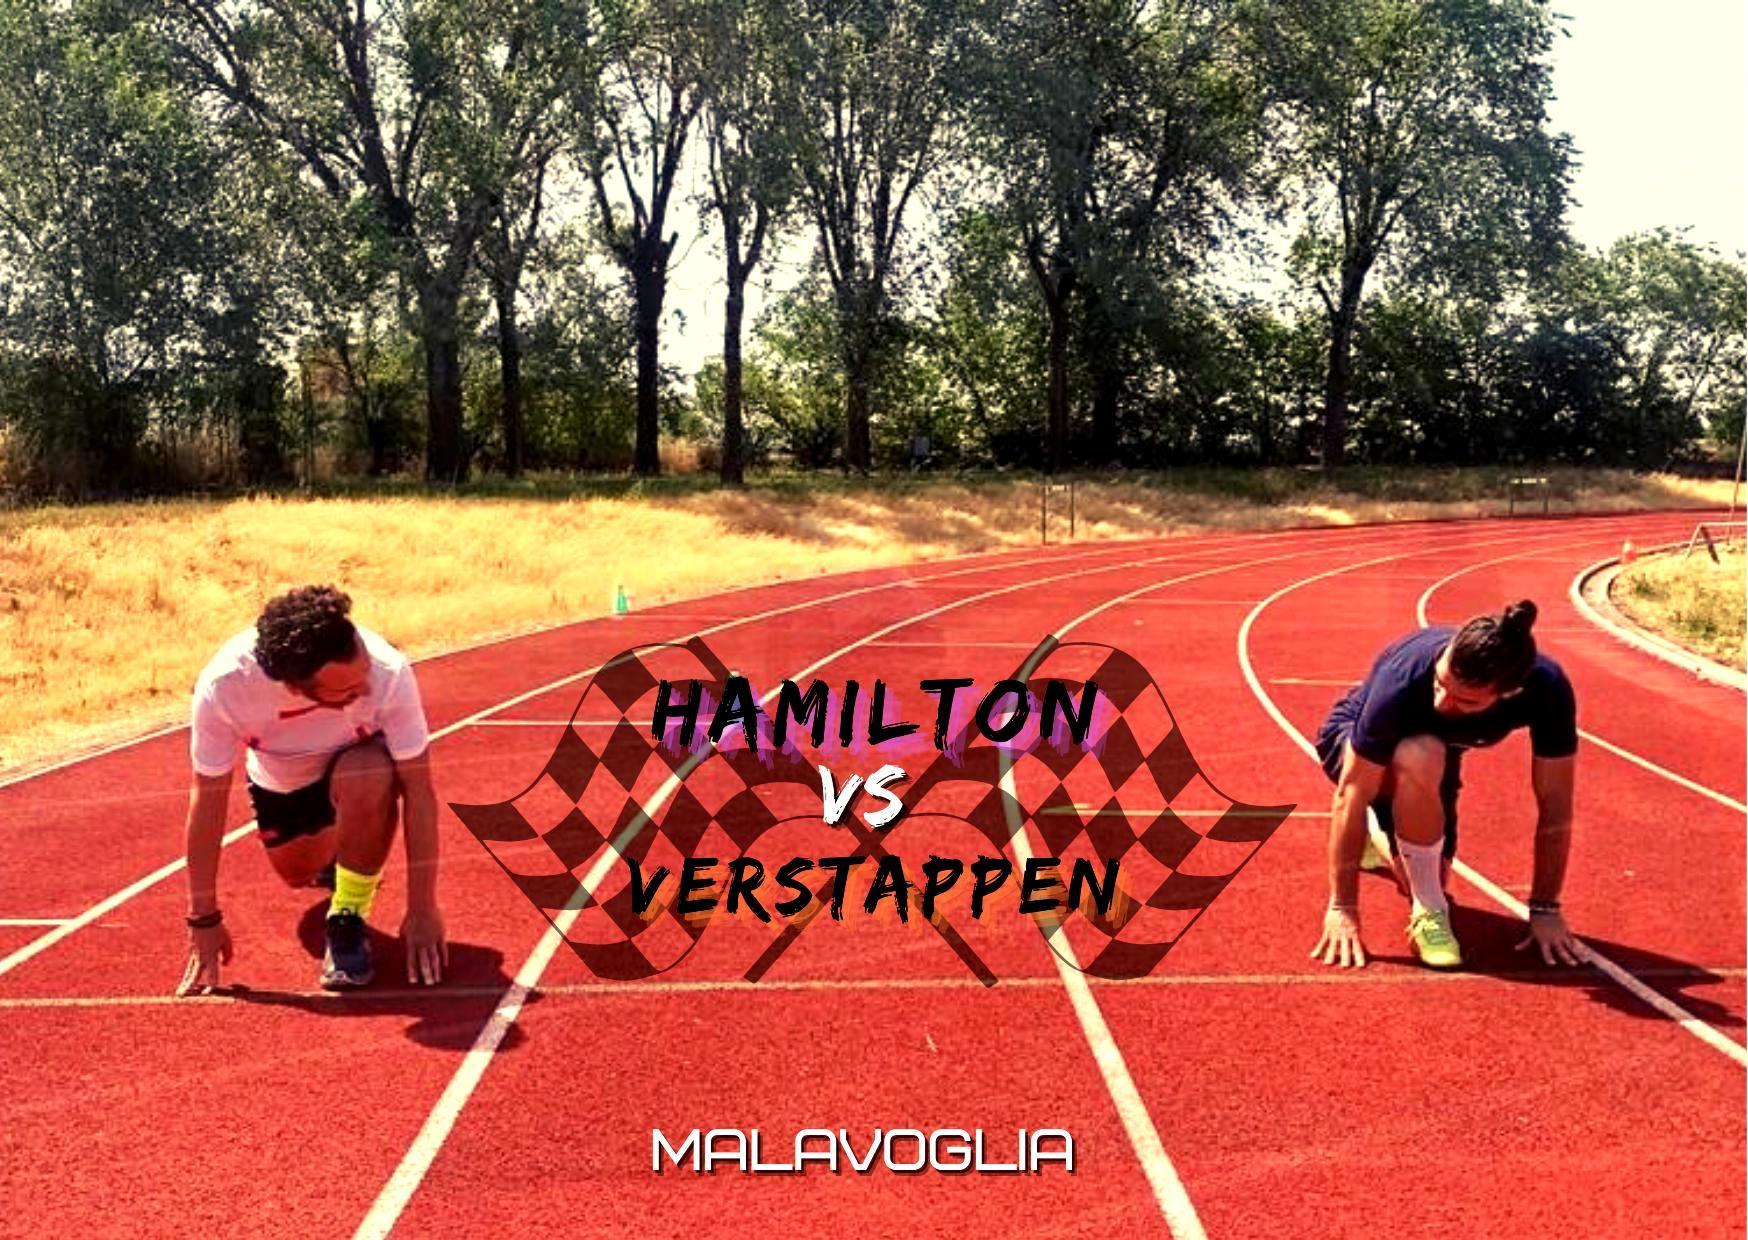 Hamilton vs Verstappen